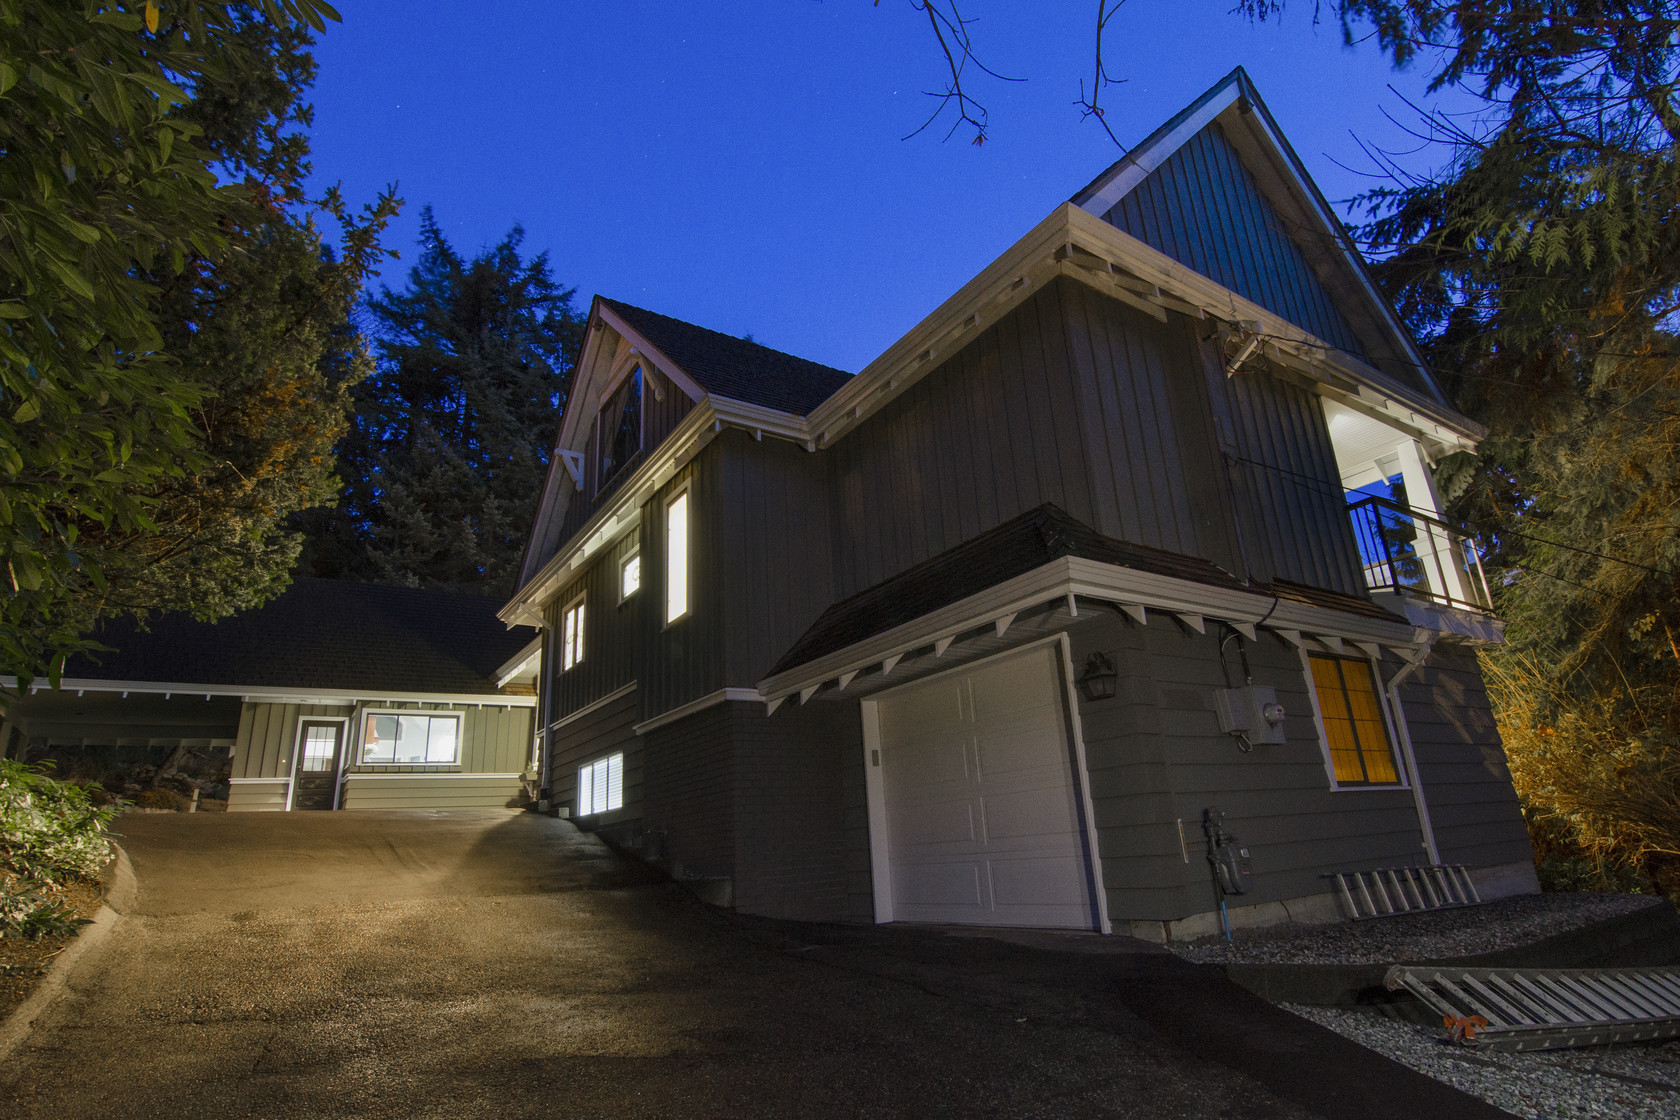 003 at 4660 Willow Creek Road, Rockridge, West Vancouver